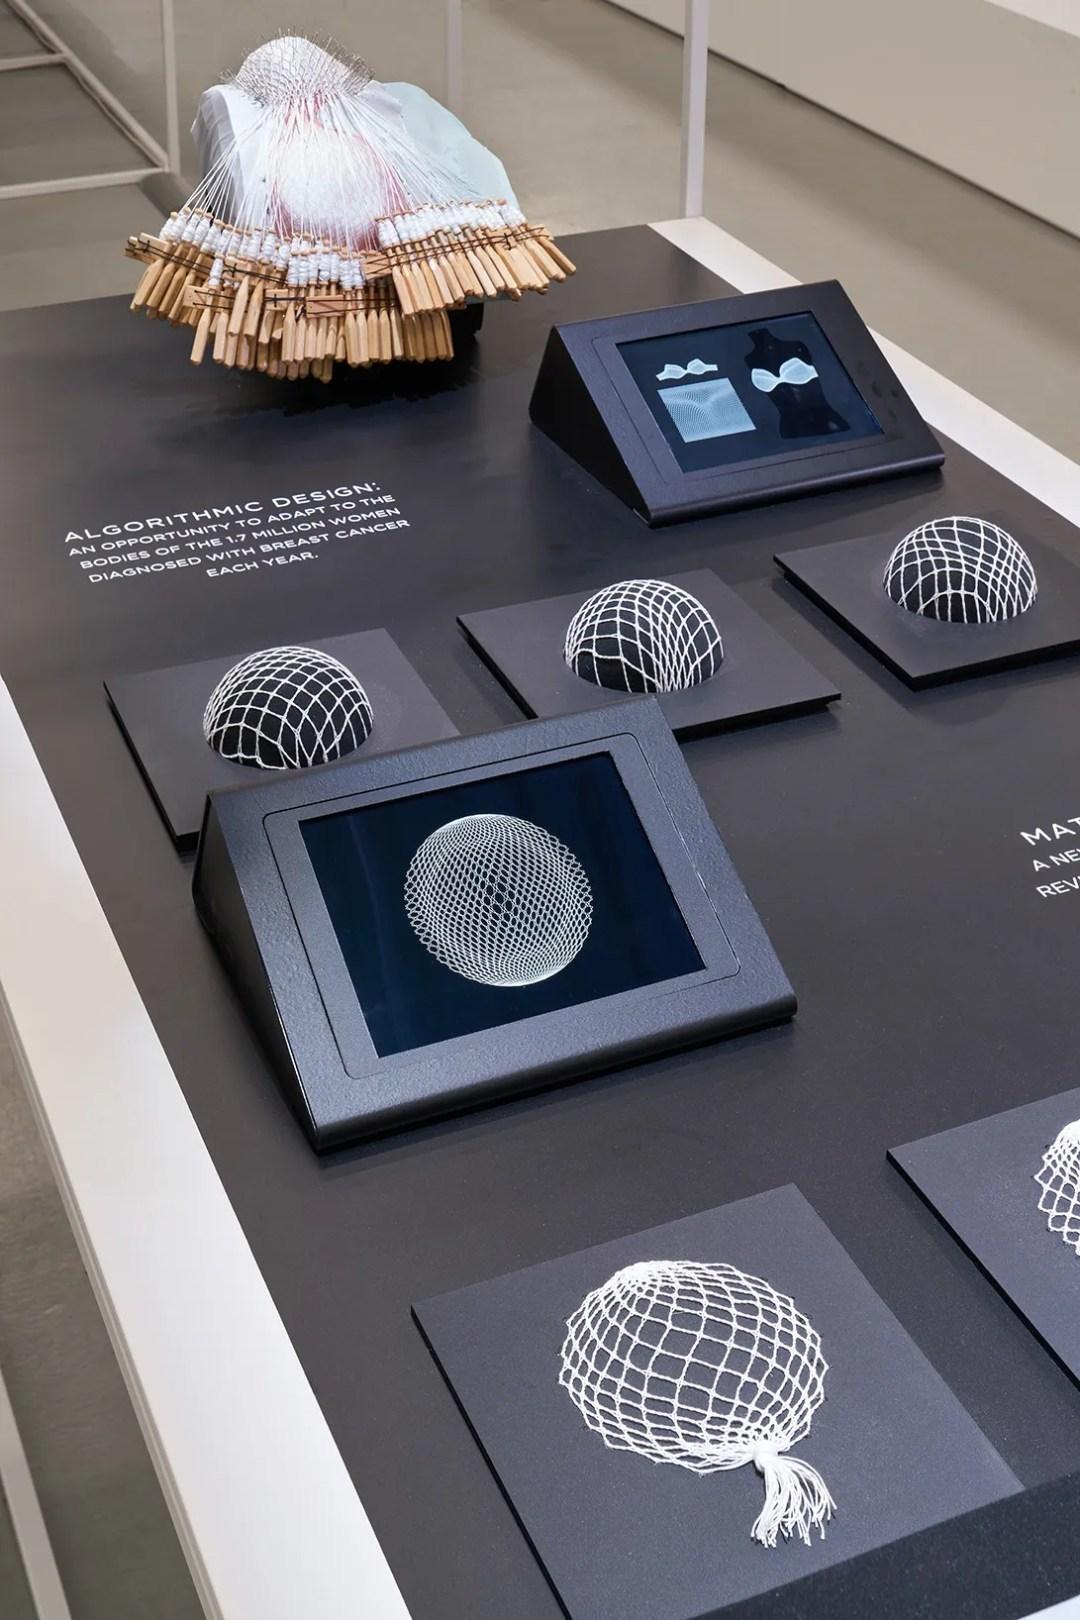 Lexus Design Awards 2019